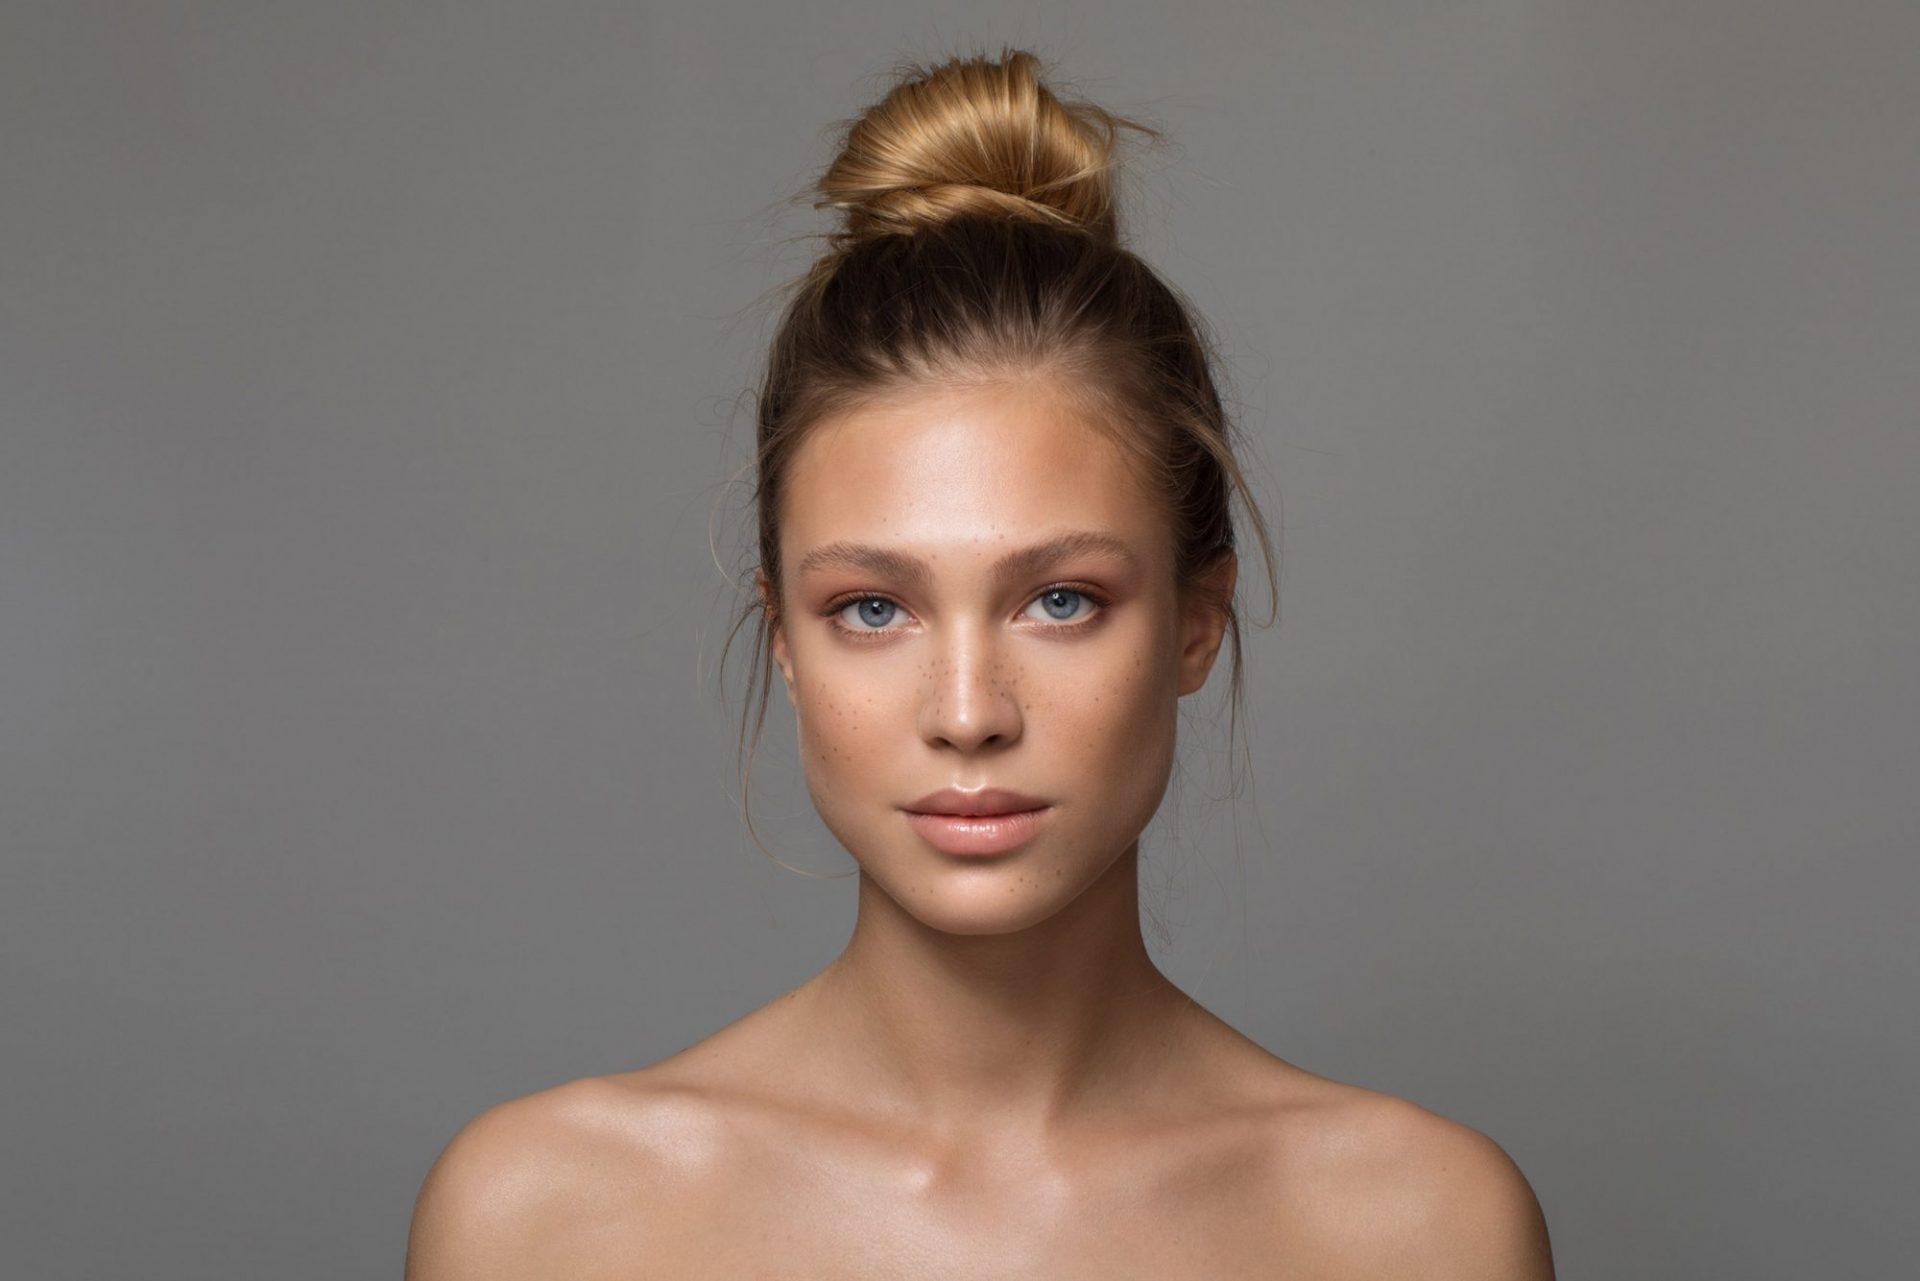 Australian skin care